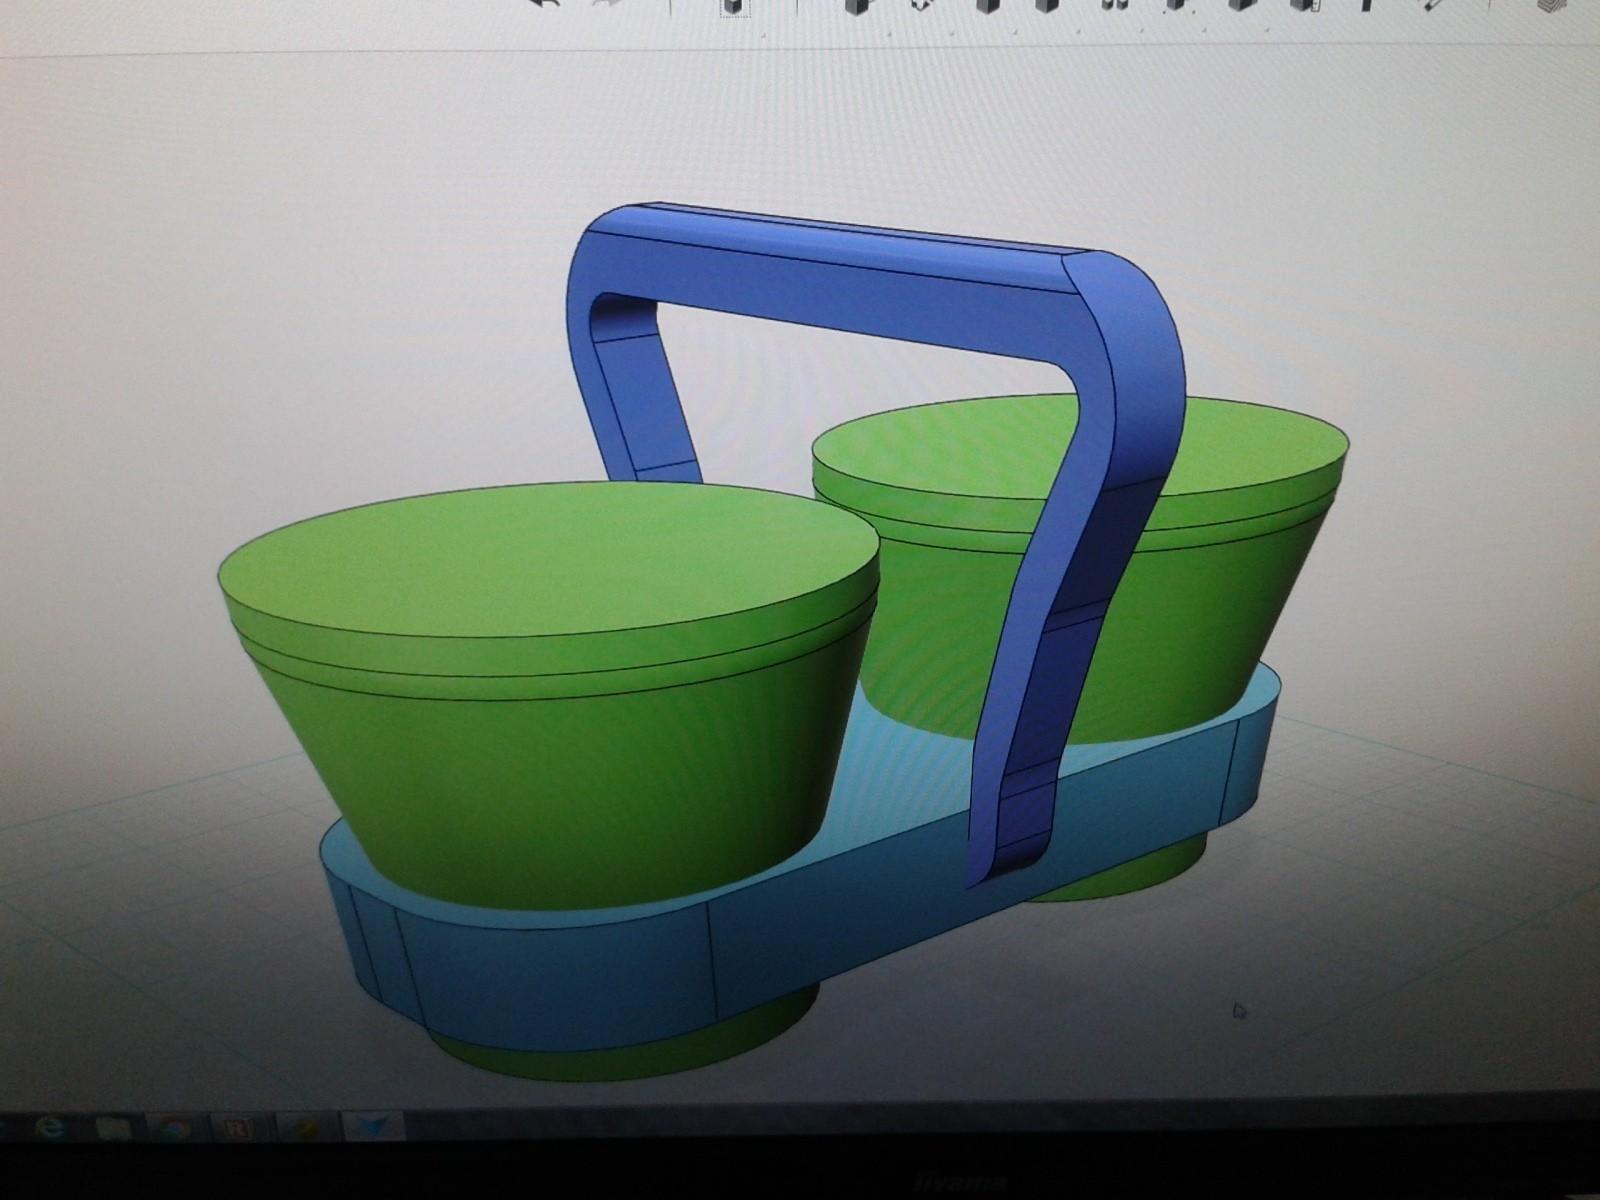 20160703_174001.jpg Download free STL file Holder for two espresso coffee mug • 3D printable design, prusai33